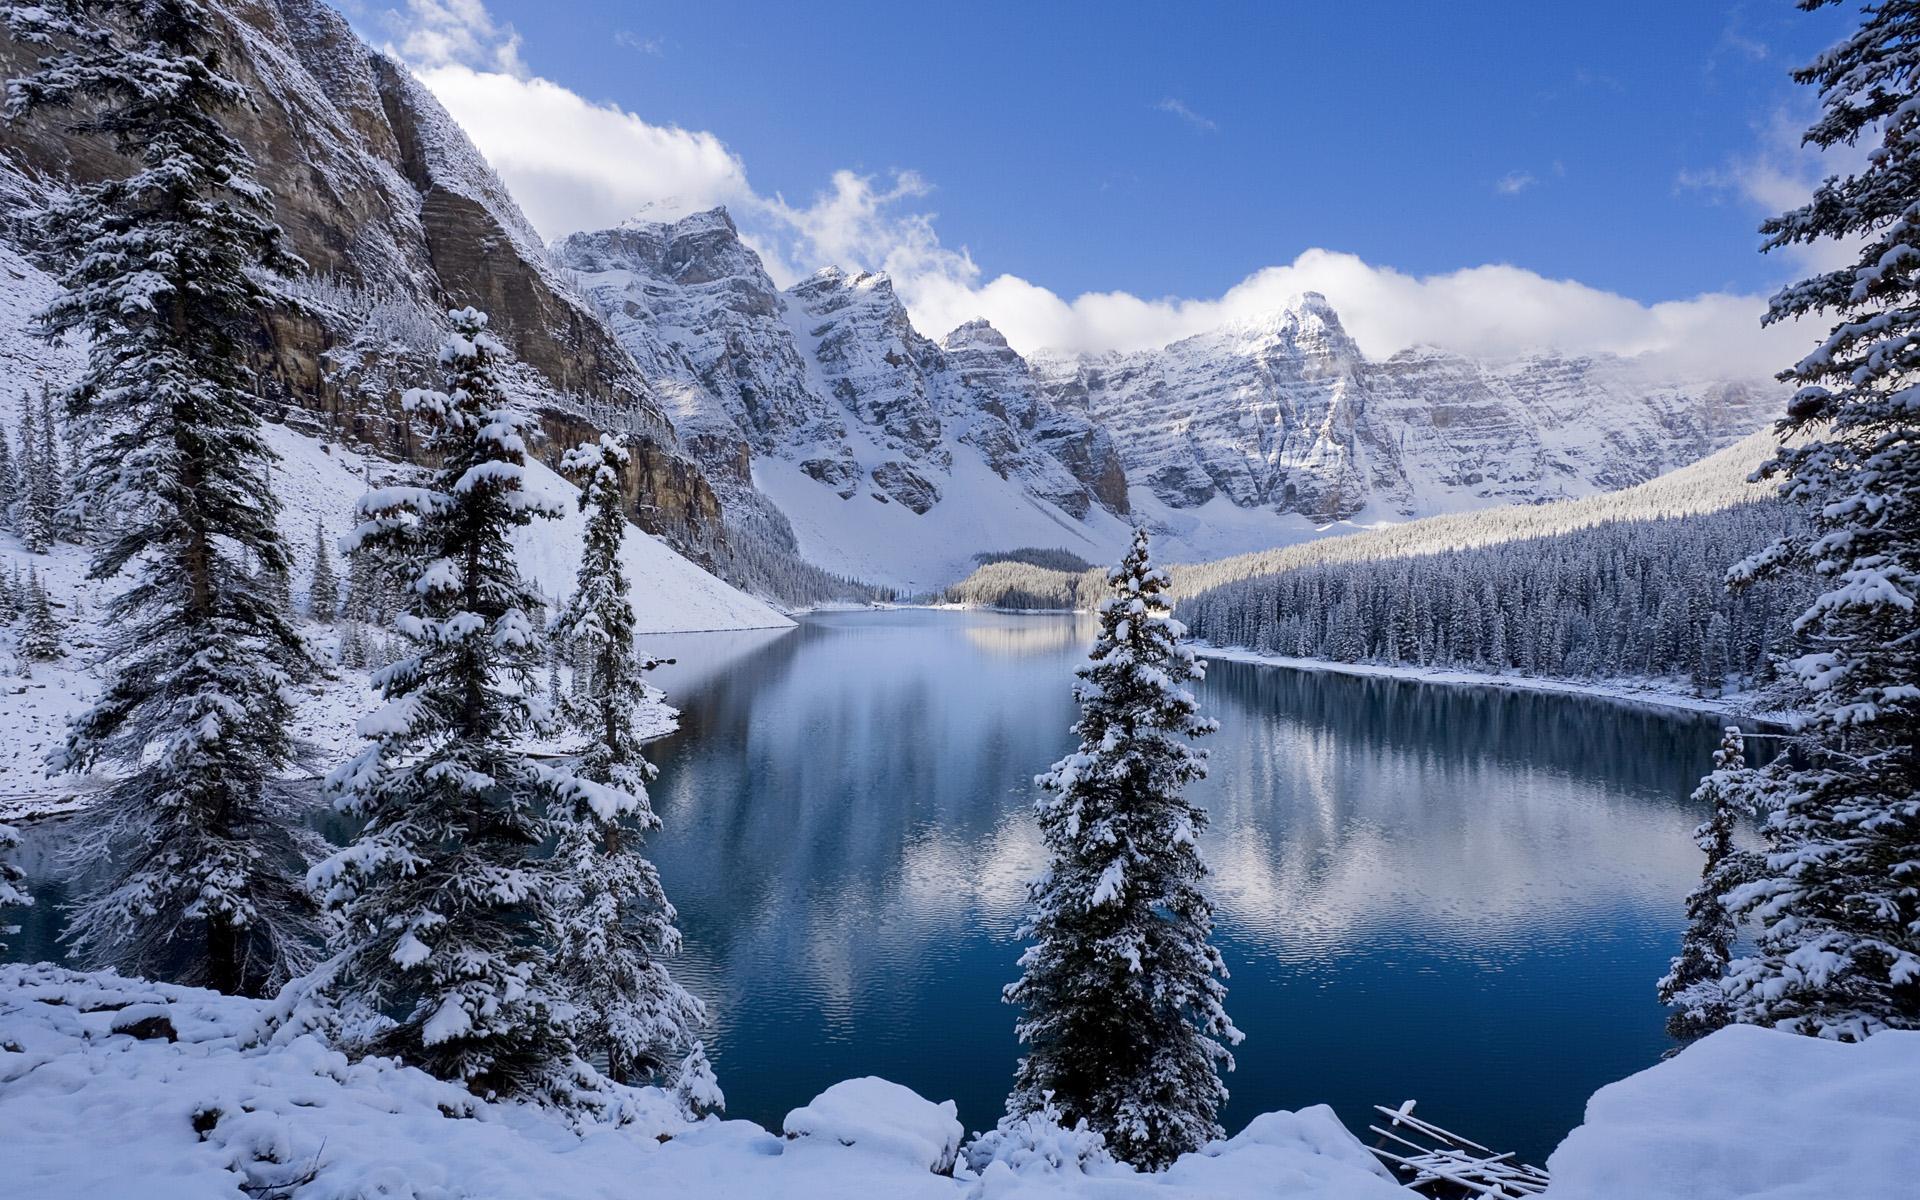 Winter Snow Pics